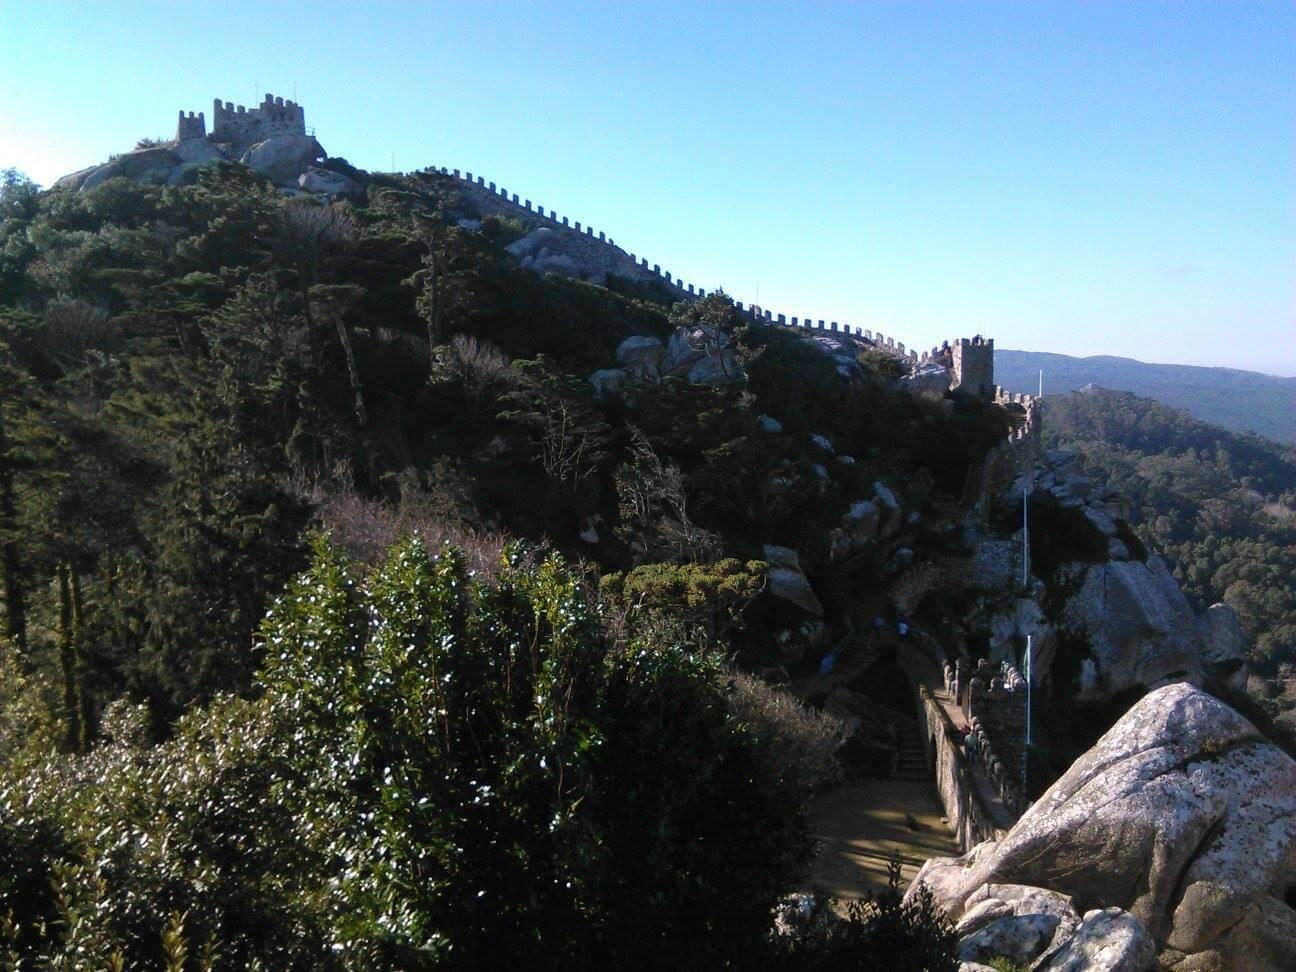 Interior Castelo dos mouros